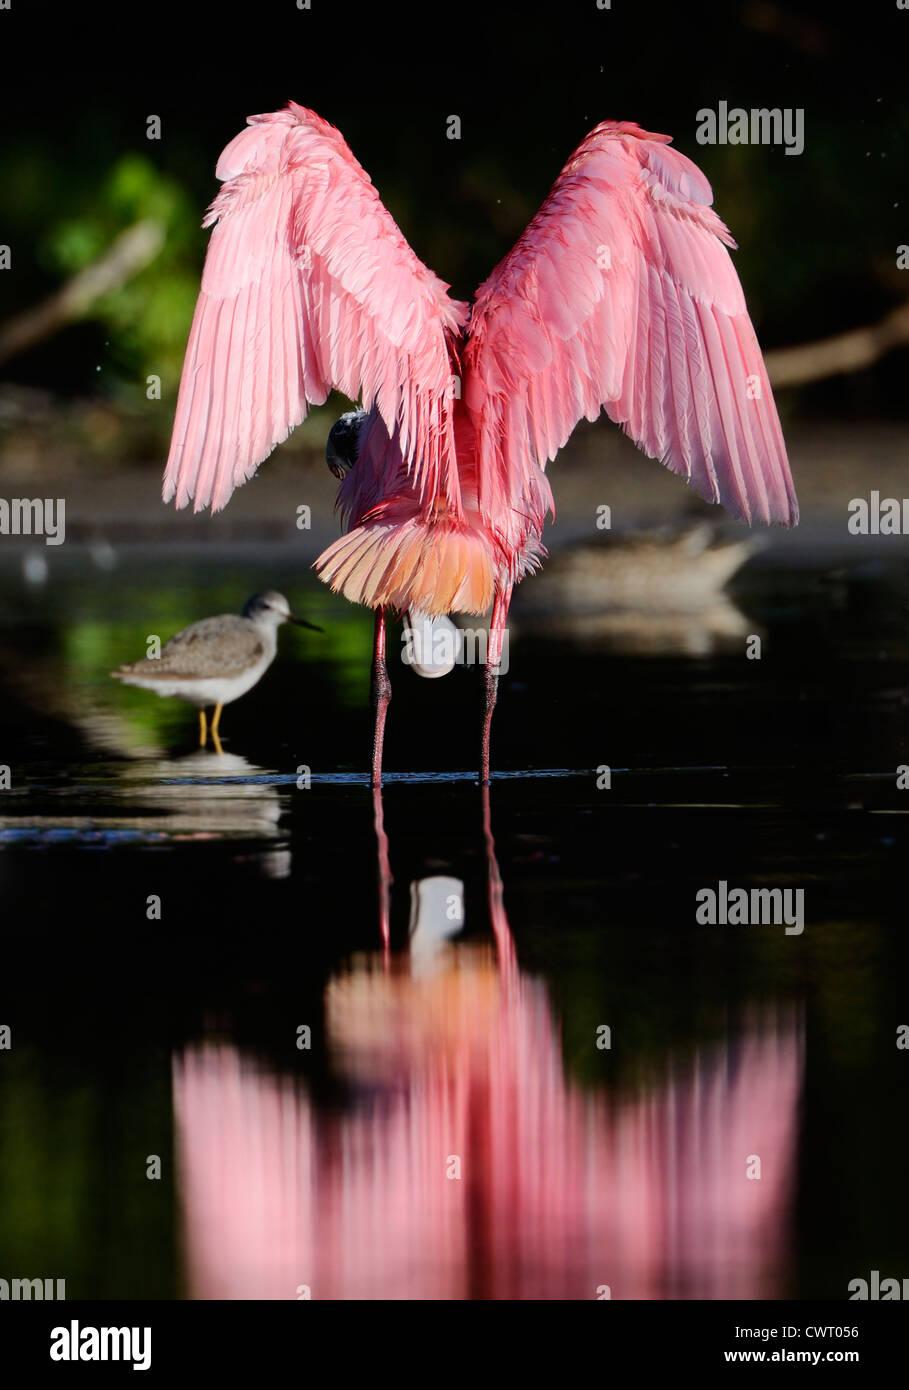 Espátula Rosada estirando sus alas Foto de stock